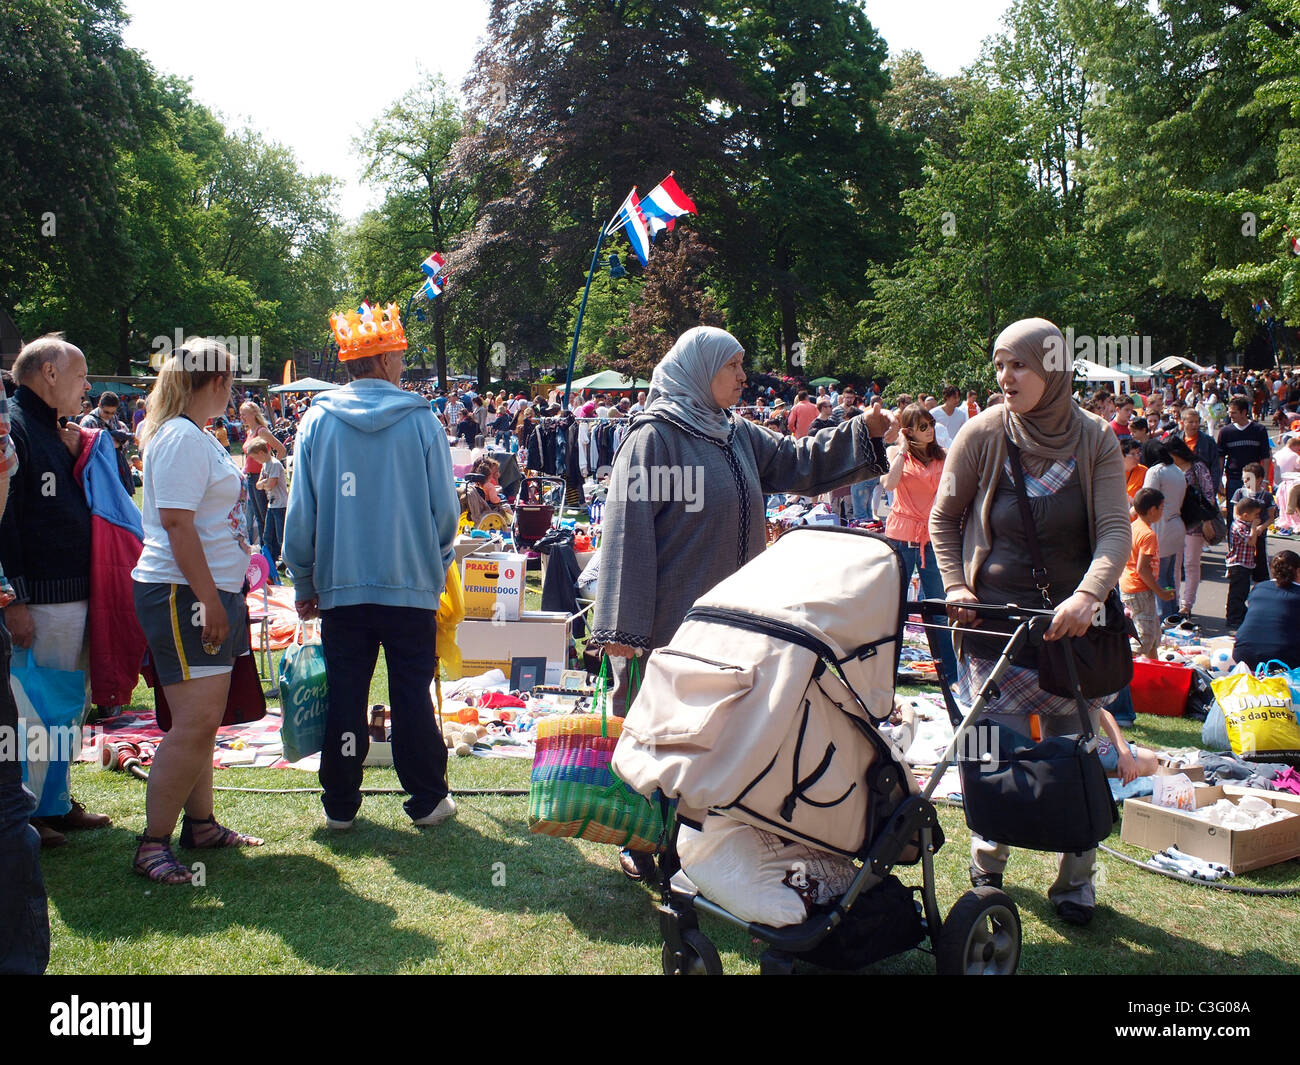 Integration, muslim women visiting the flea market on april 30th, queen's day, in Valkenberg park in Breda, - Stock Image